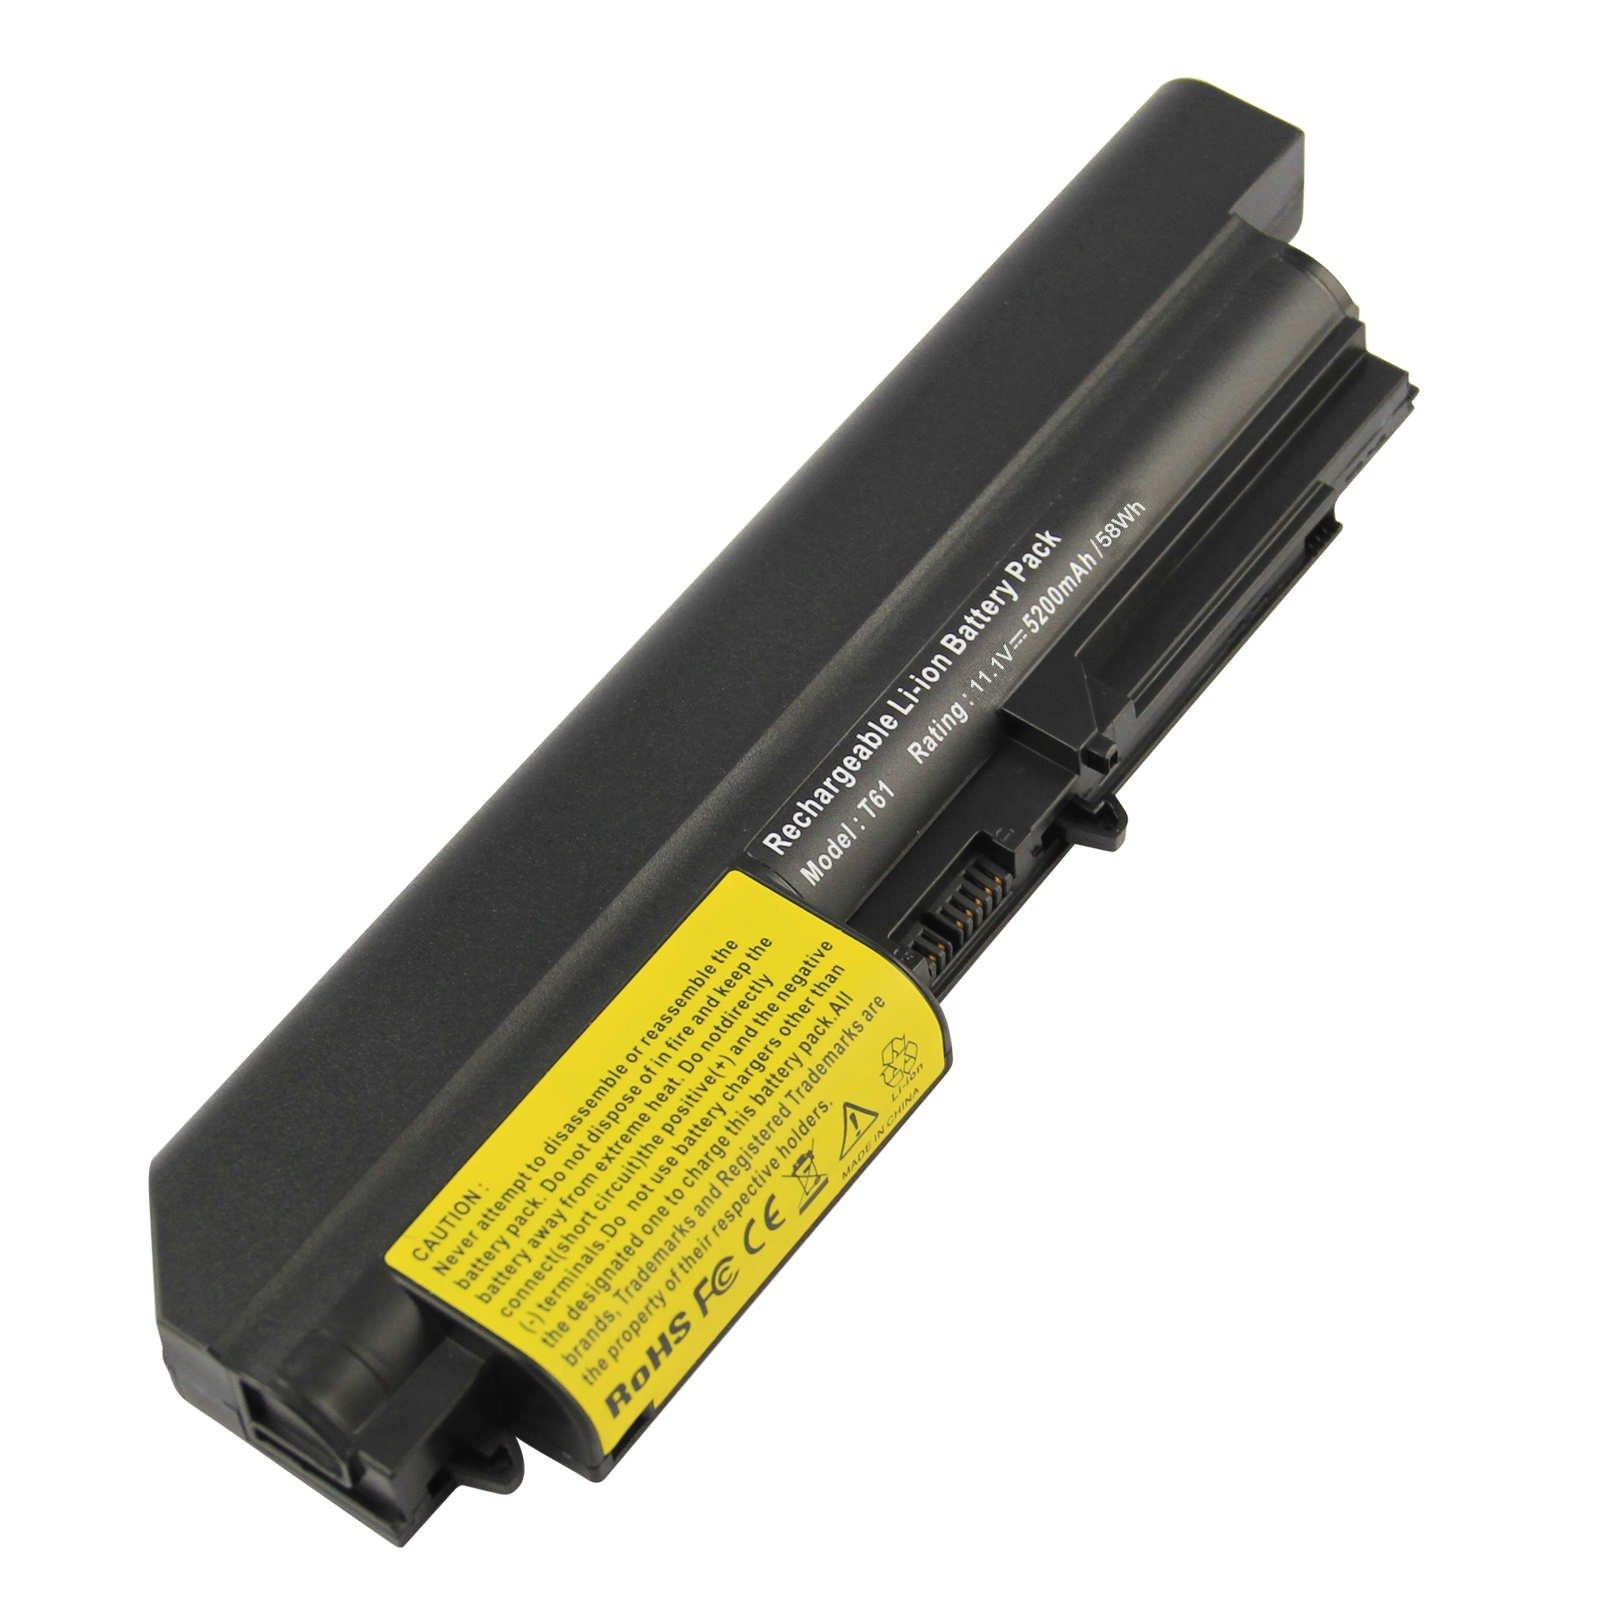 Bateria 6 Celdas Para Ibm/lenovo 42t4533 42t4652 43r2499 Thinkpad R400 T400 Thinkpad Widescreen R61i T61p Thinkpad Wides